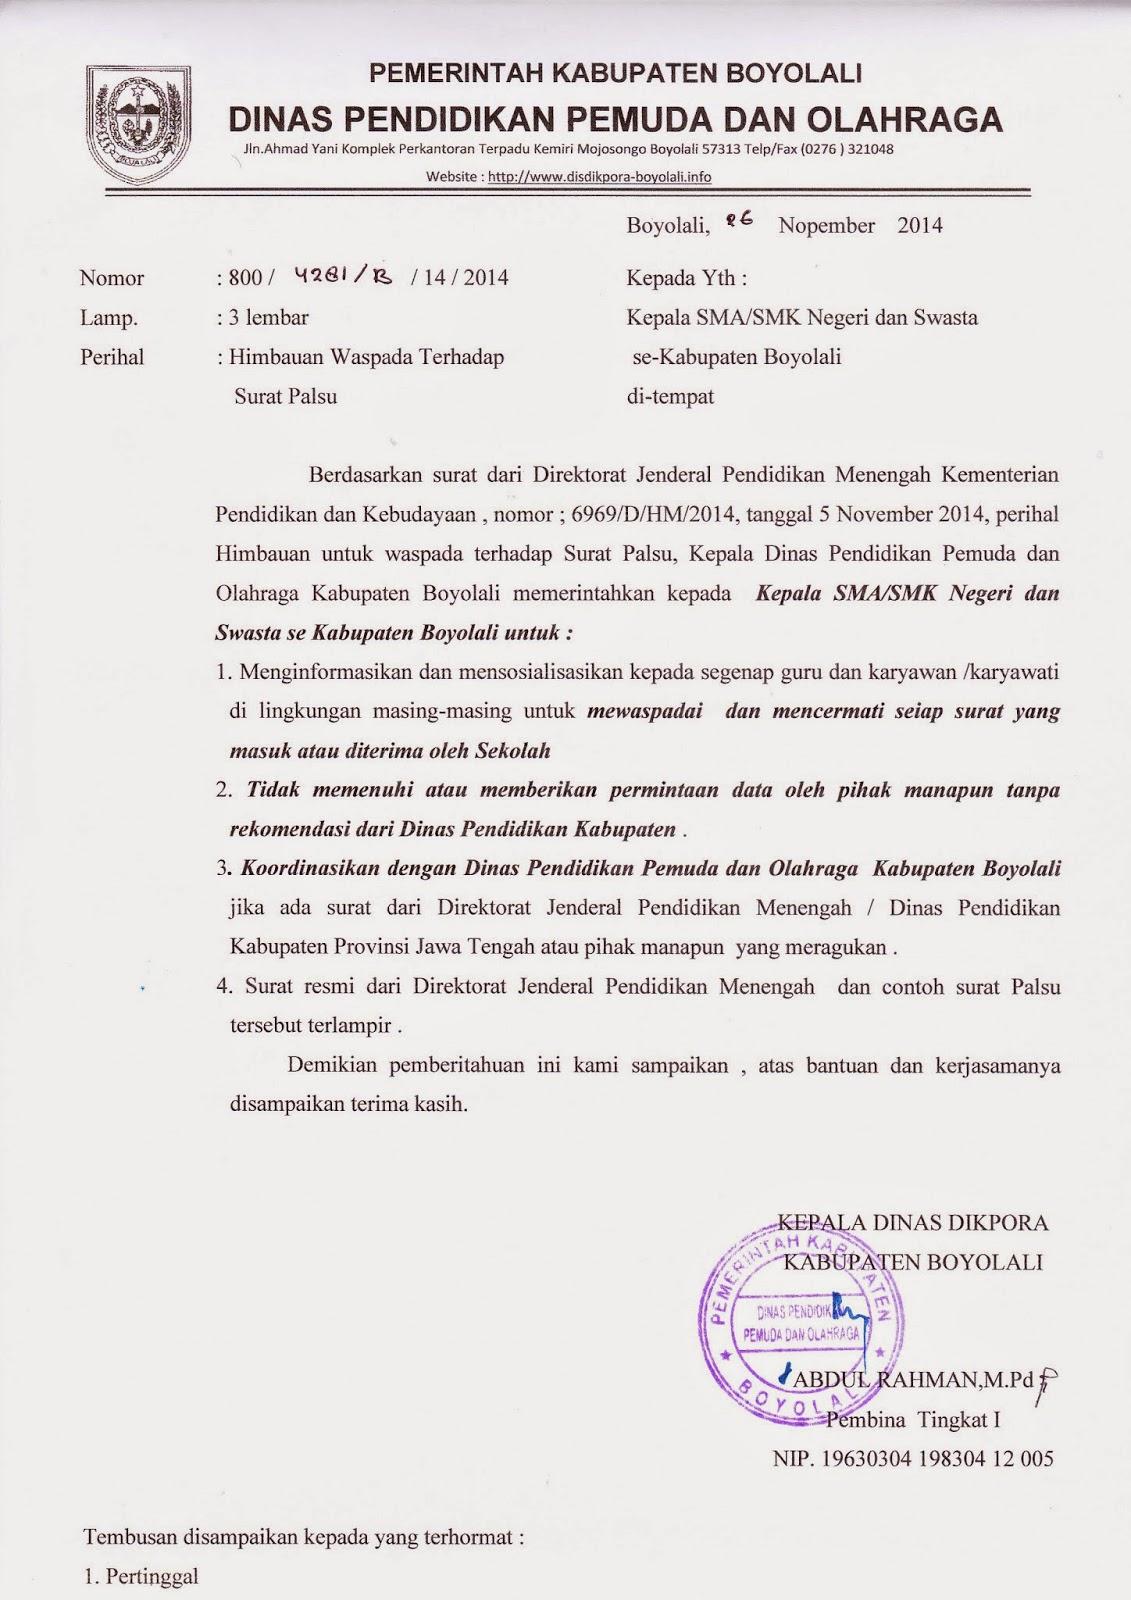 Info Sma Smk Kabupaten Boyolali Himbauan Waspada Terhadap Surat Palsu